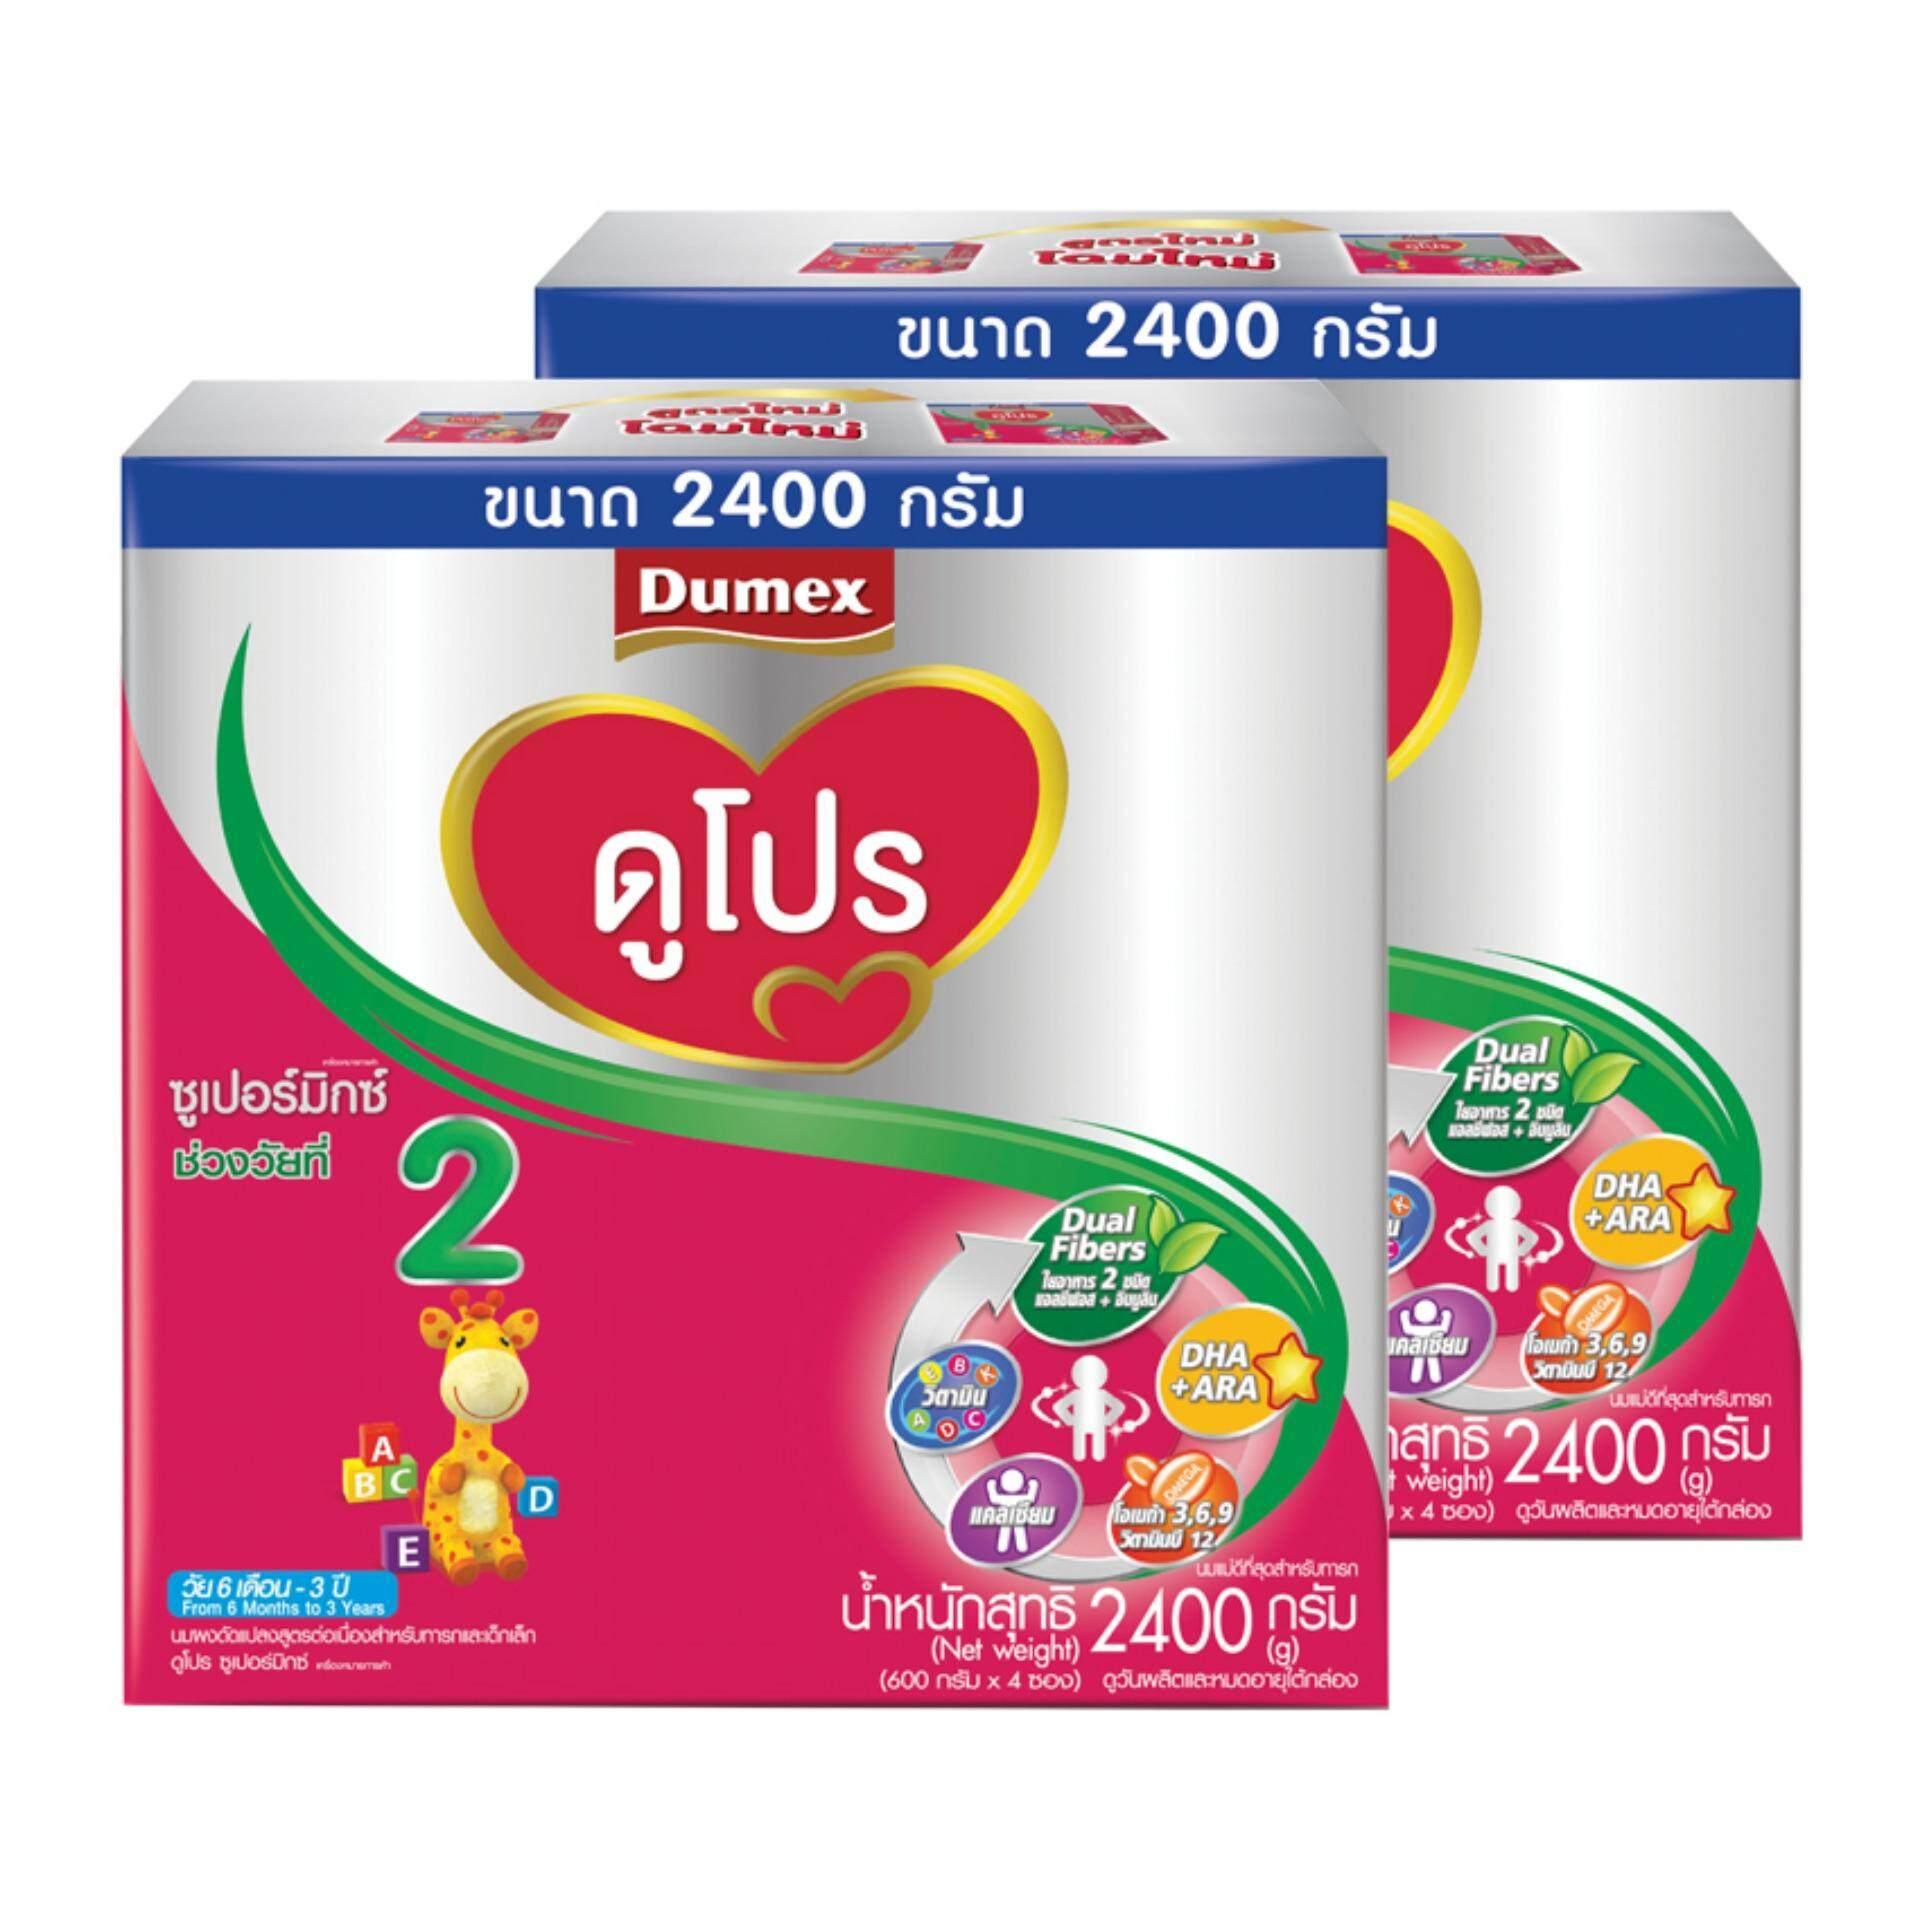 DUMEX ดูเม็กซ์ นมผงสำหรับเด็ก ช่วงวัยที่ 2 ดูโปร ซูเปอร์มิกซ์ 2400 กรัม (แพ็ค 2 กล่อง)